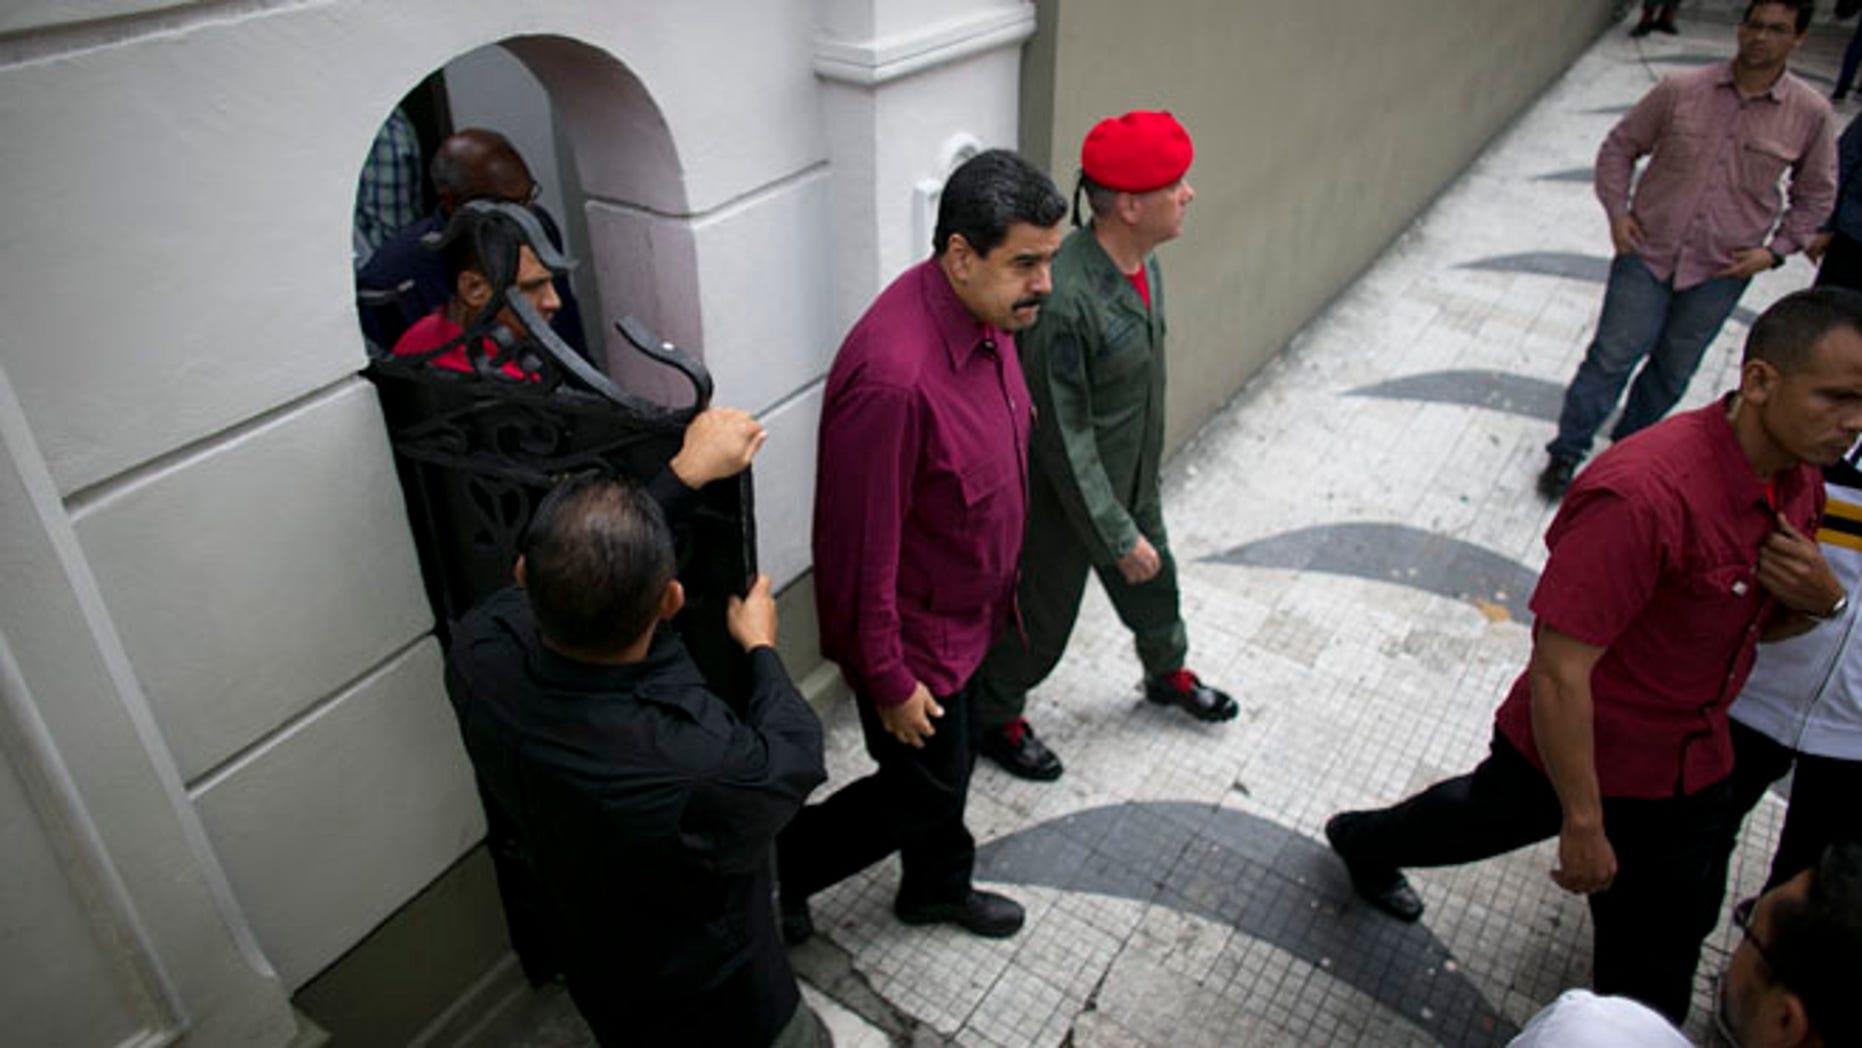 President Maduro exits an area of Miraflores presidential palace in Caracas, Venezuela, Friday, Oct. 28, 2016.